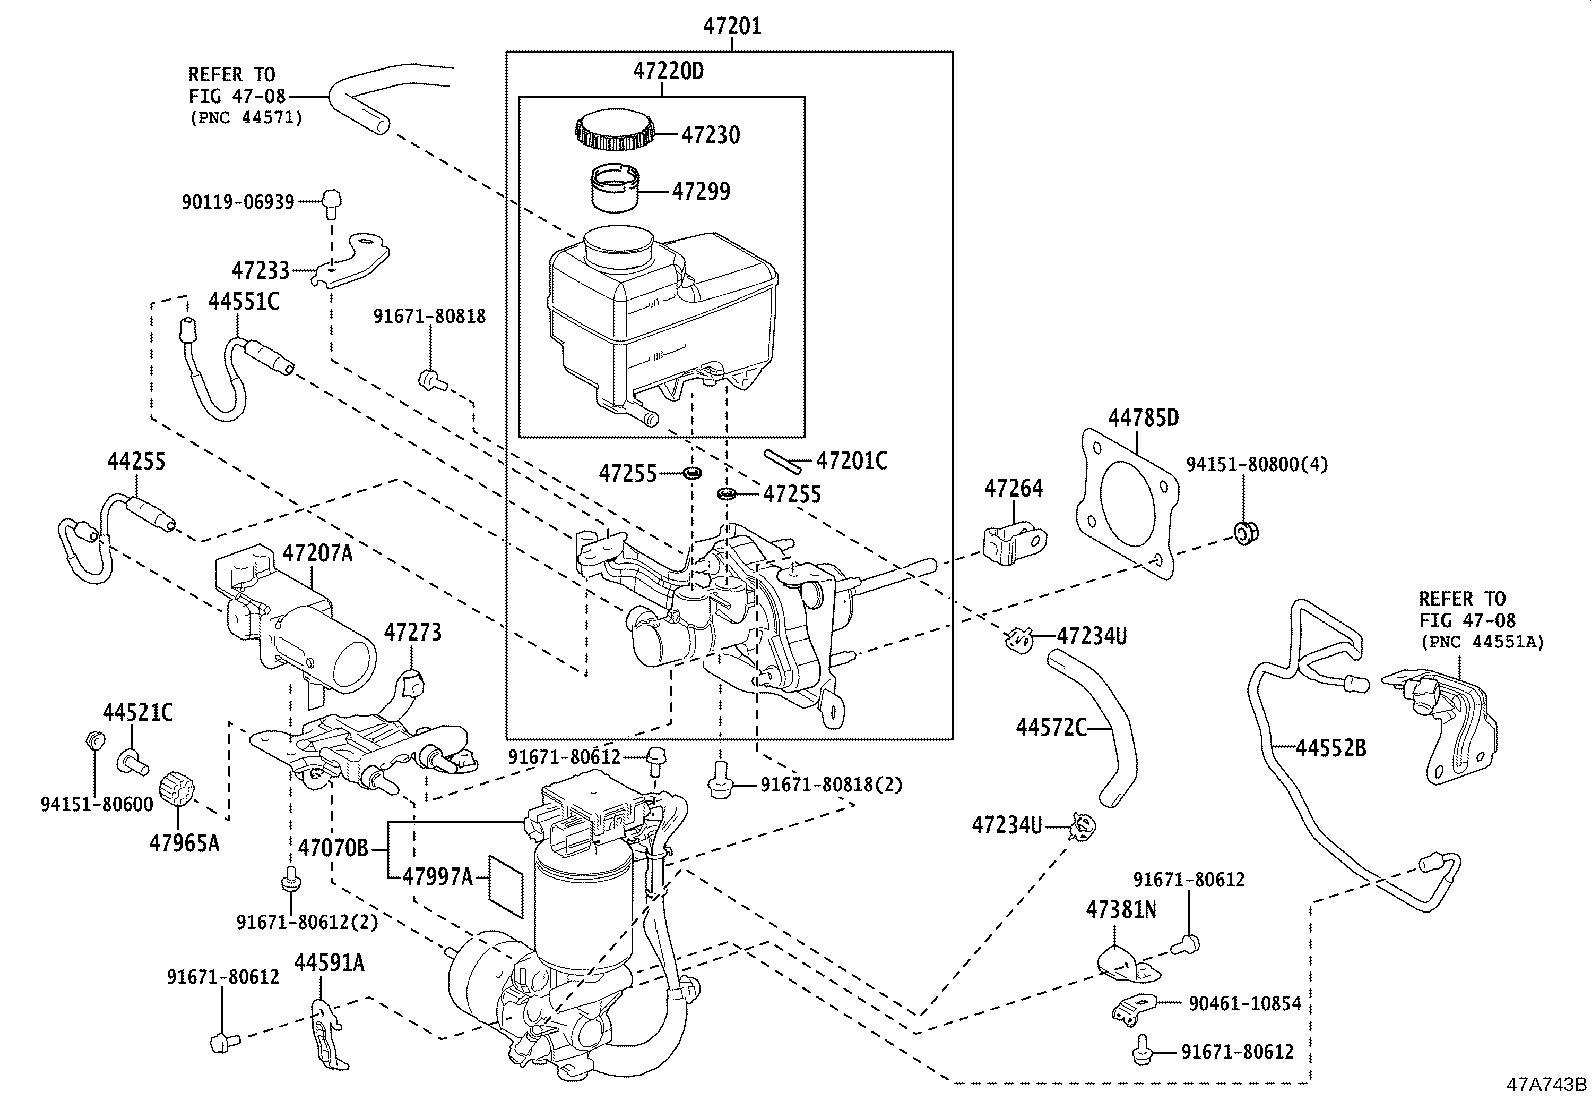 Lexus Lc 500 Reservoir Assembly Brake Master Cylinder